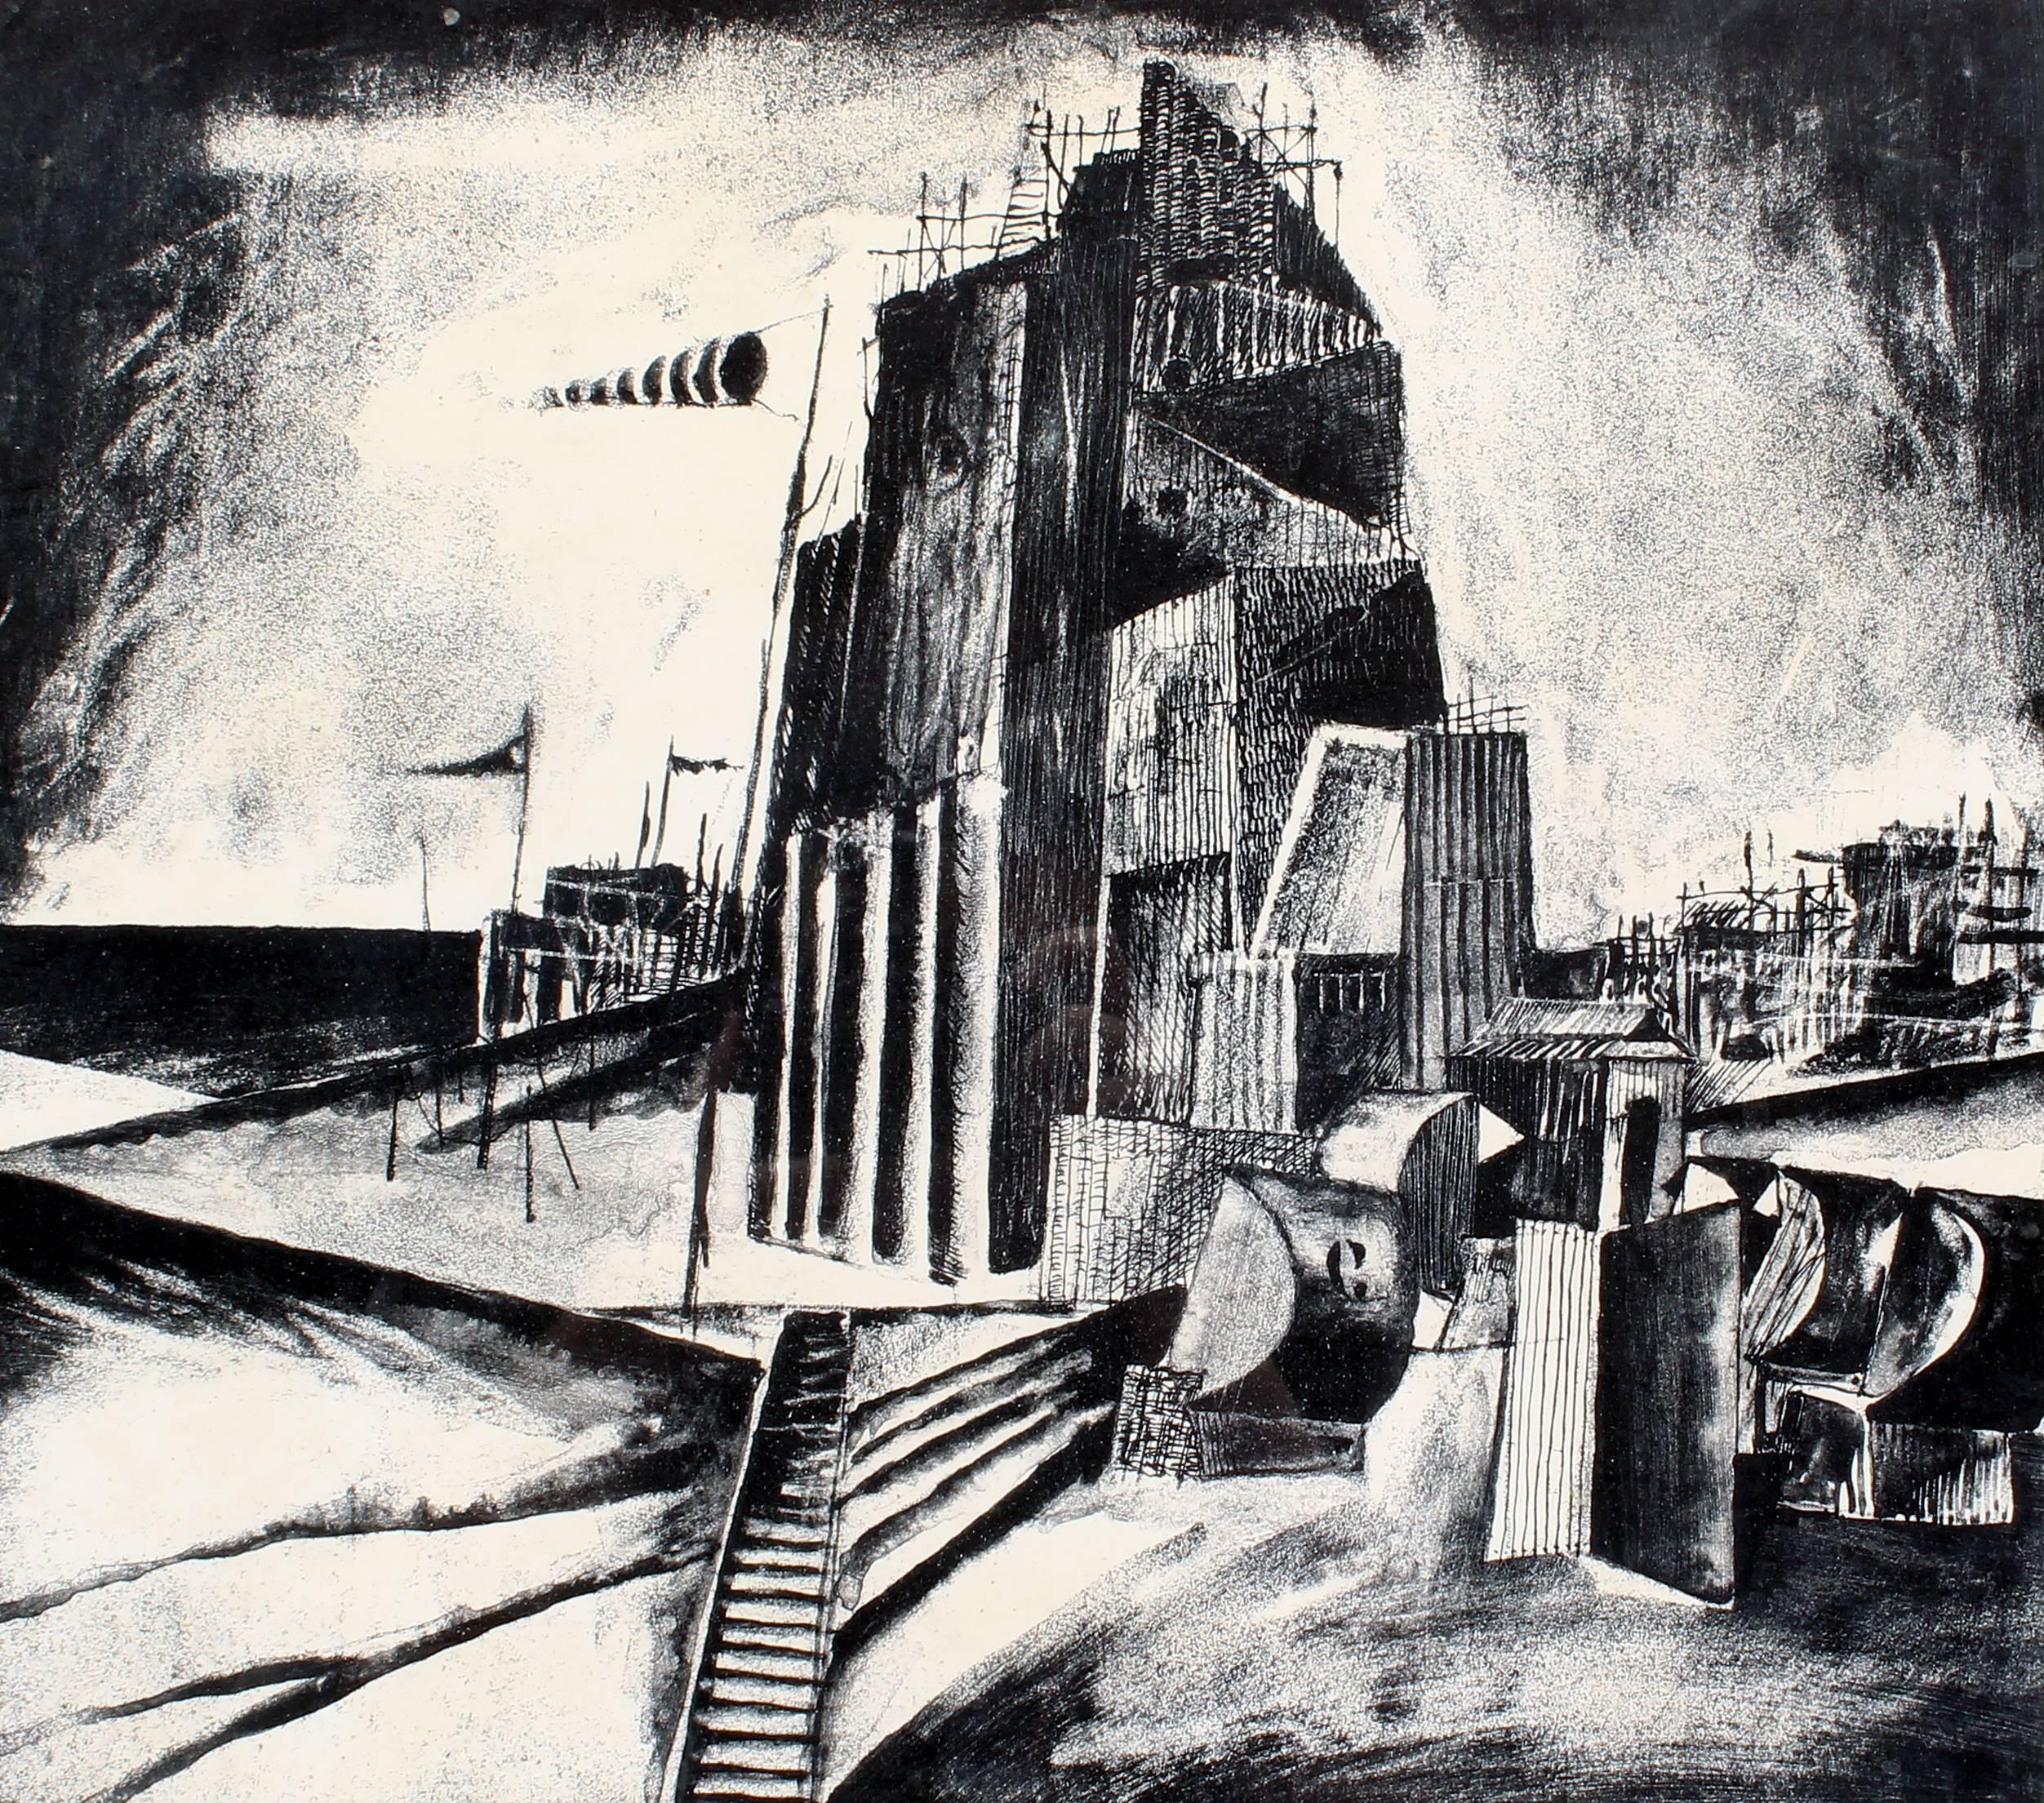 Modern American Industrial Landscape